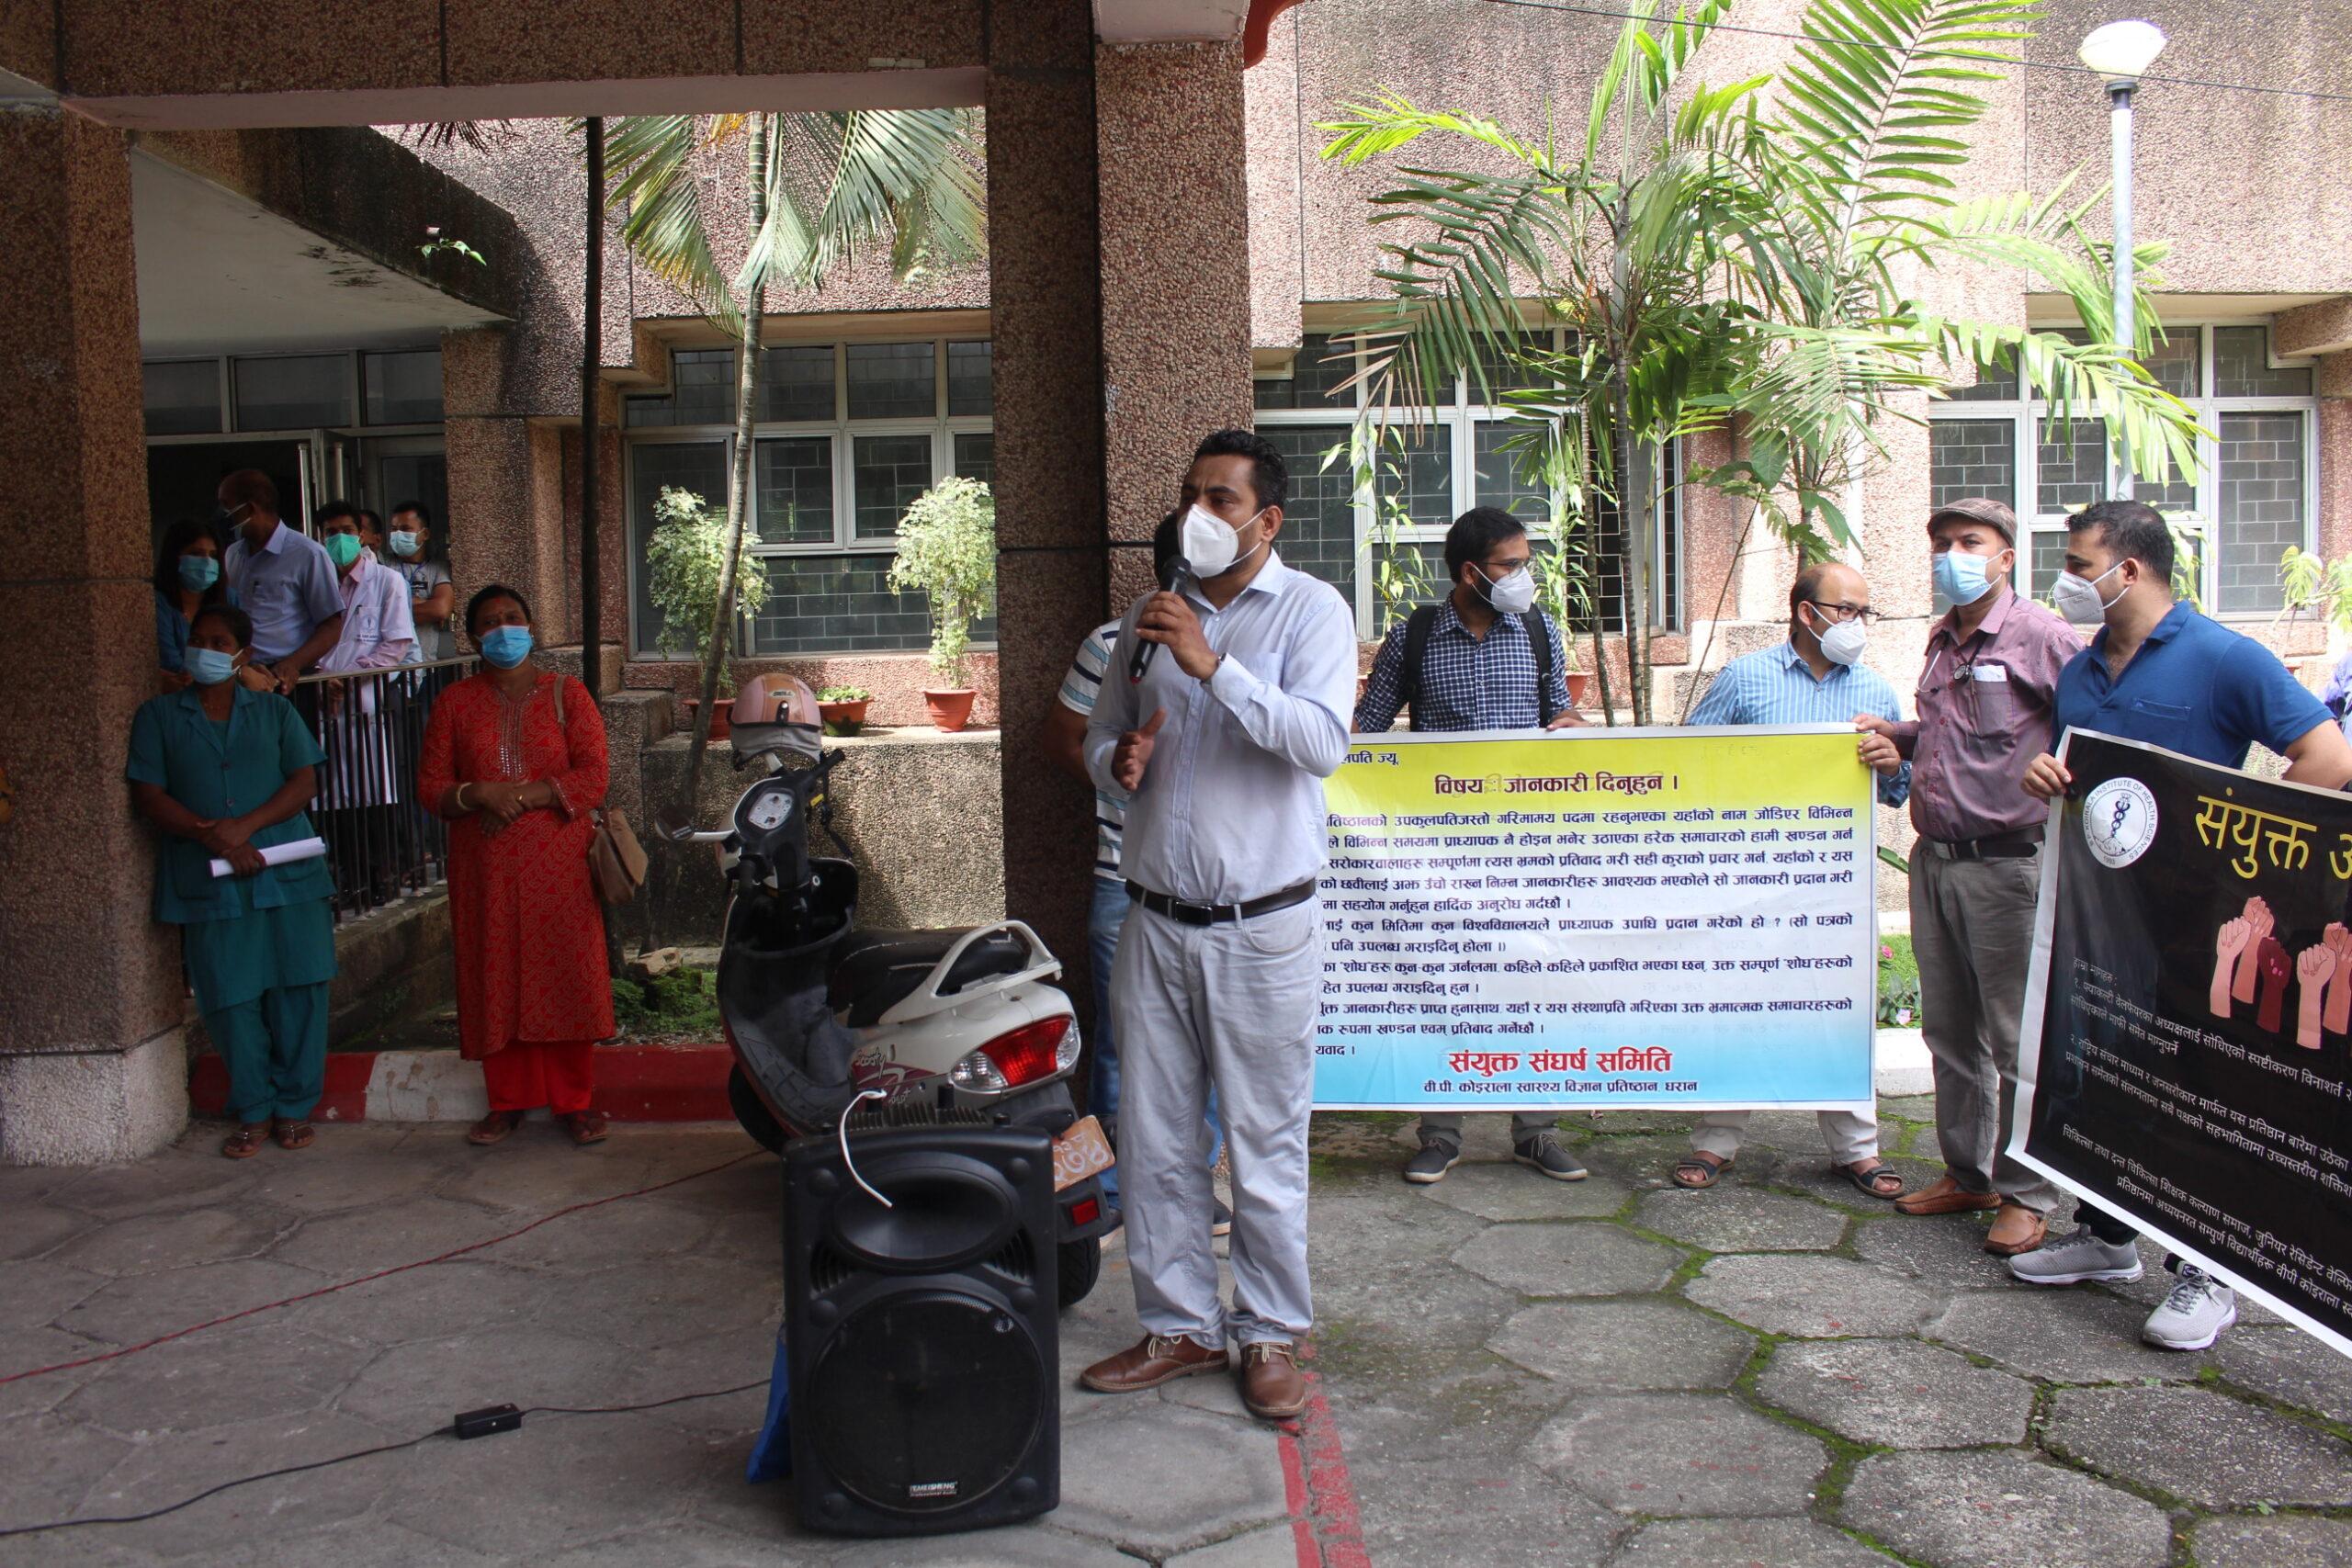 वीपी प्रतिष्ठानका चिकित्सक, कर्मचारीहरुद्वारा वृहत प्रर्दशन